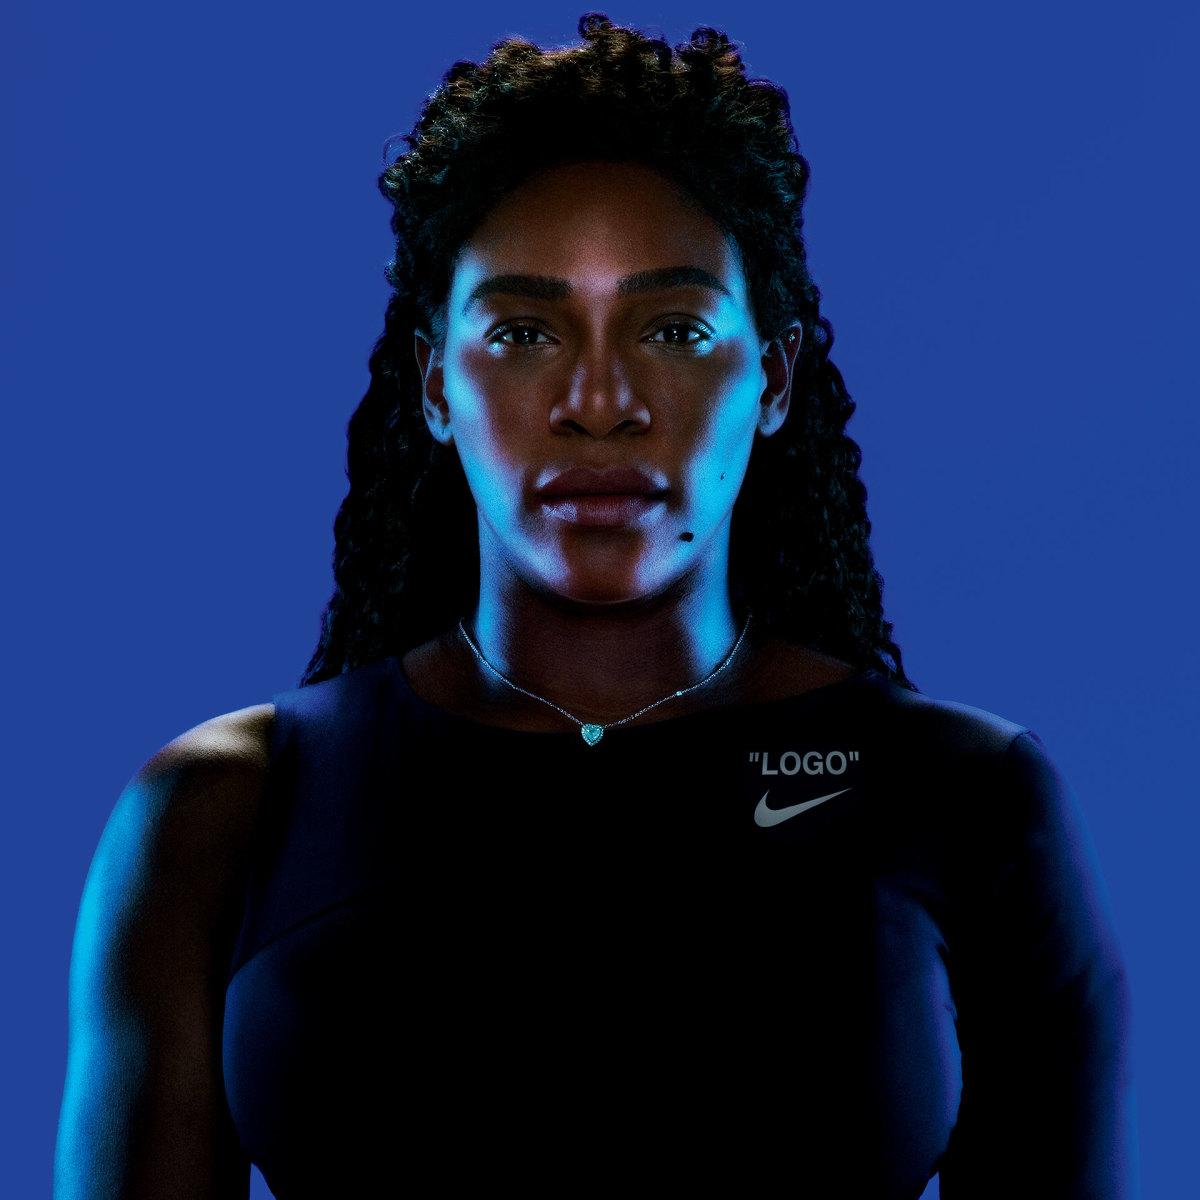 Serena Williams in Nike x Virgil Abloh for Serena Williams Dress. Photo: Nike